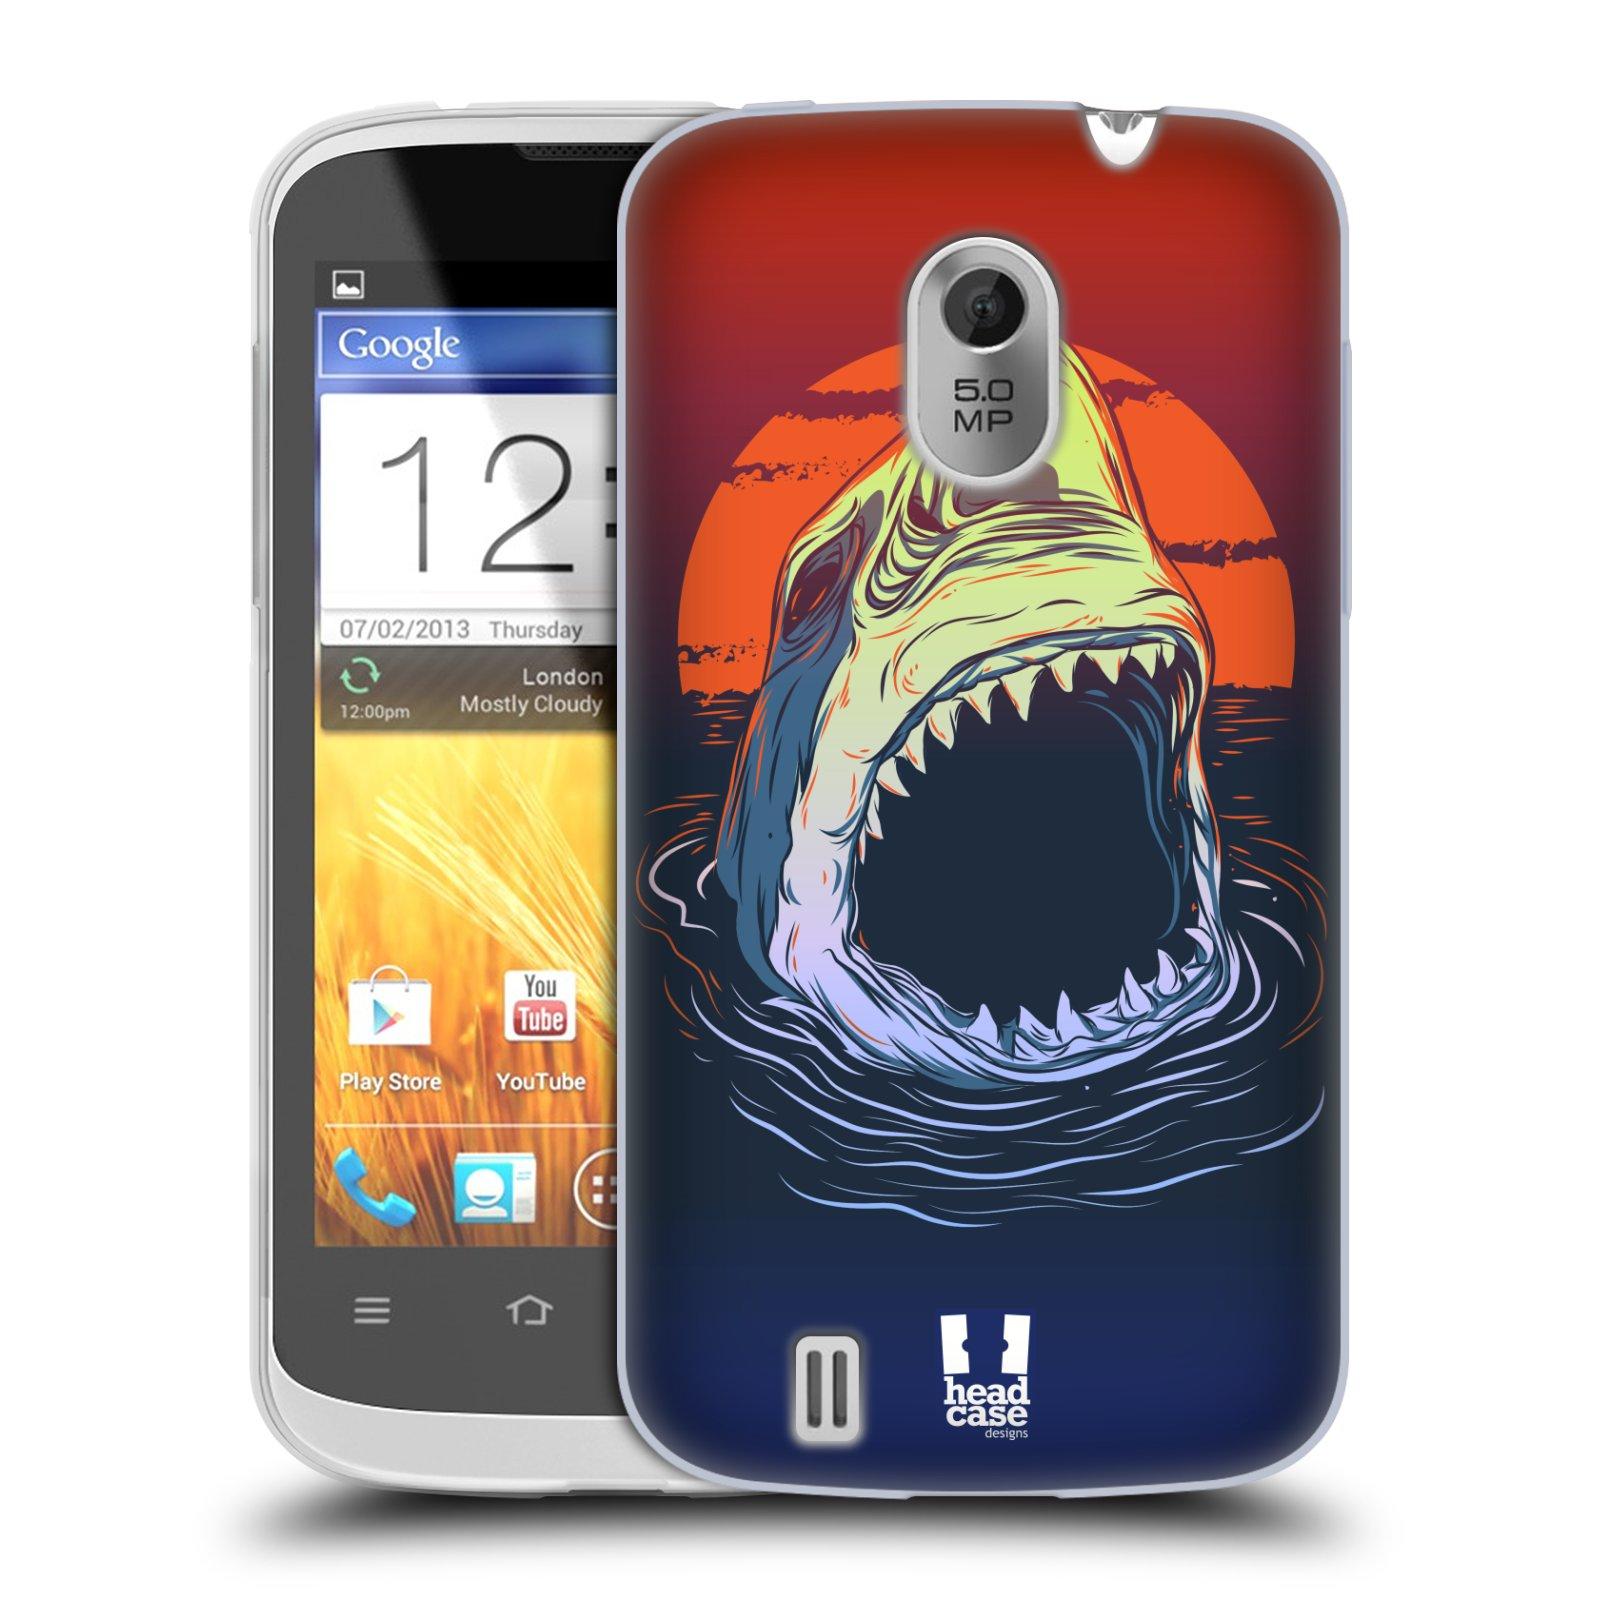 Silikonové pouzdro na mobil ZTE Blade III HEAD CASE HLADOVÝ ŽRALOK (Silikonový kryt či obal na mobilní telefon ZTE Blade 3)